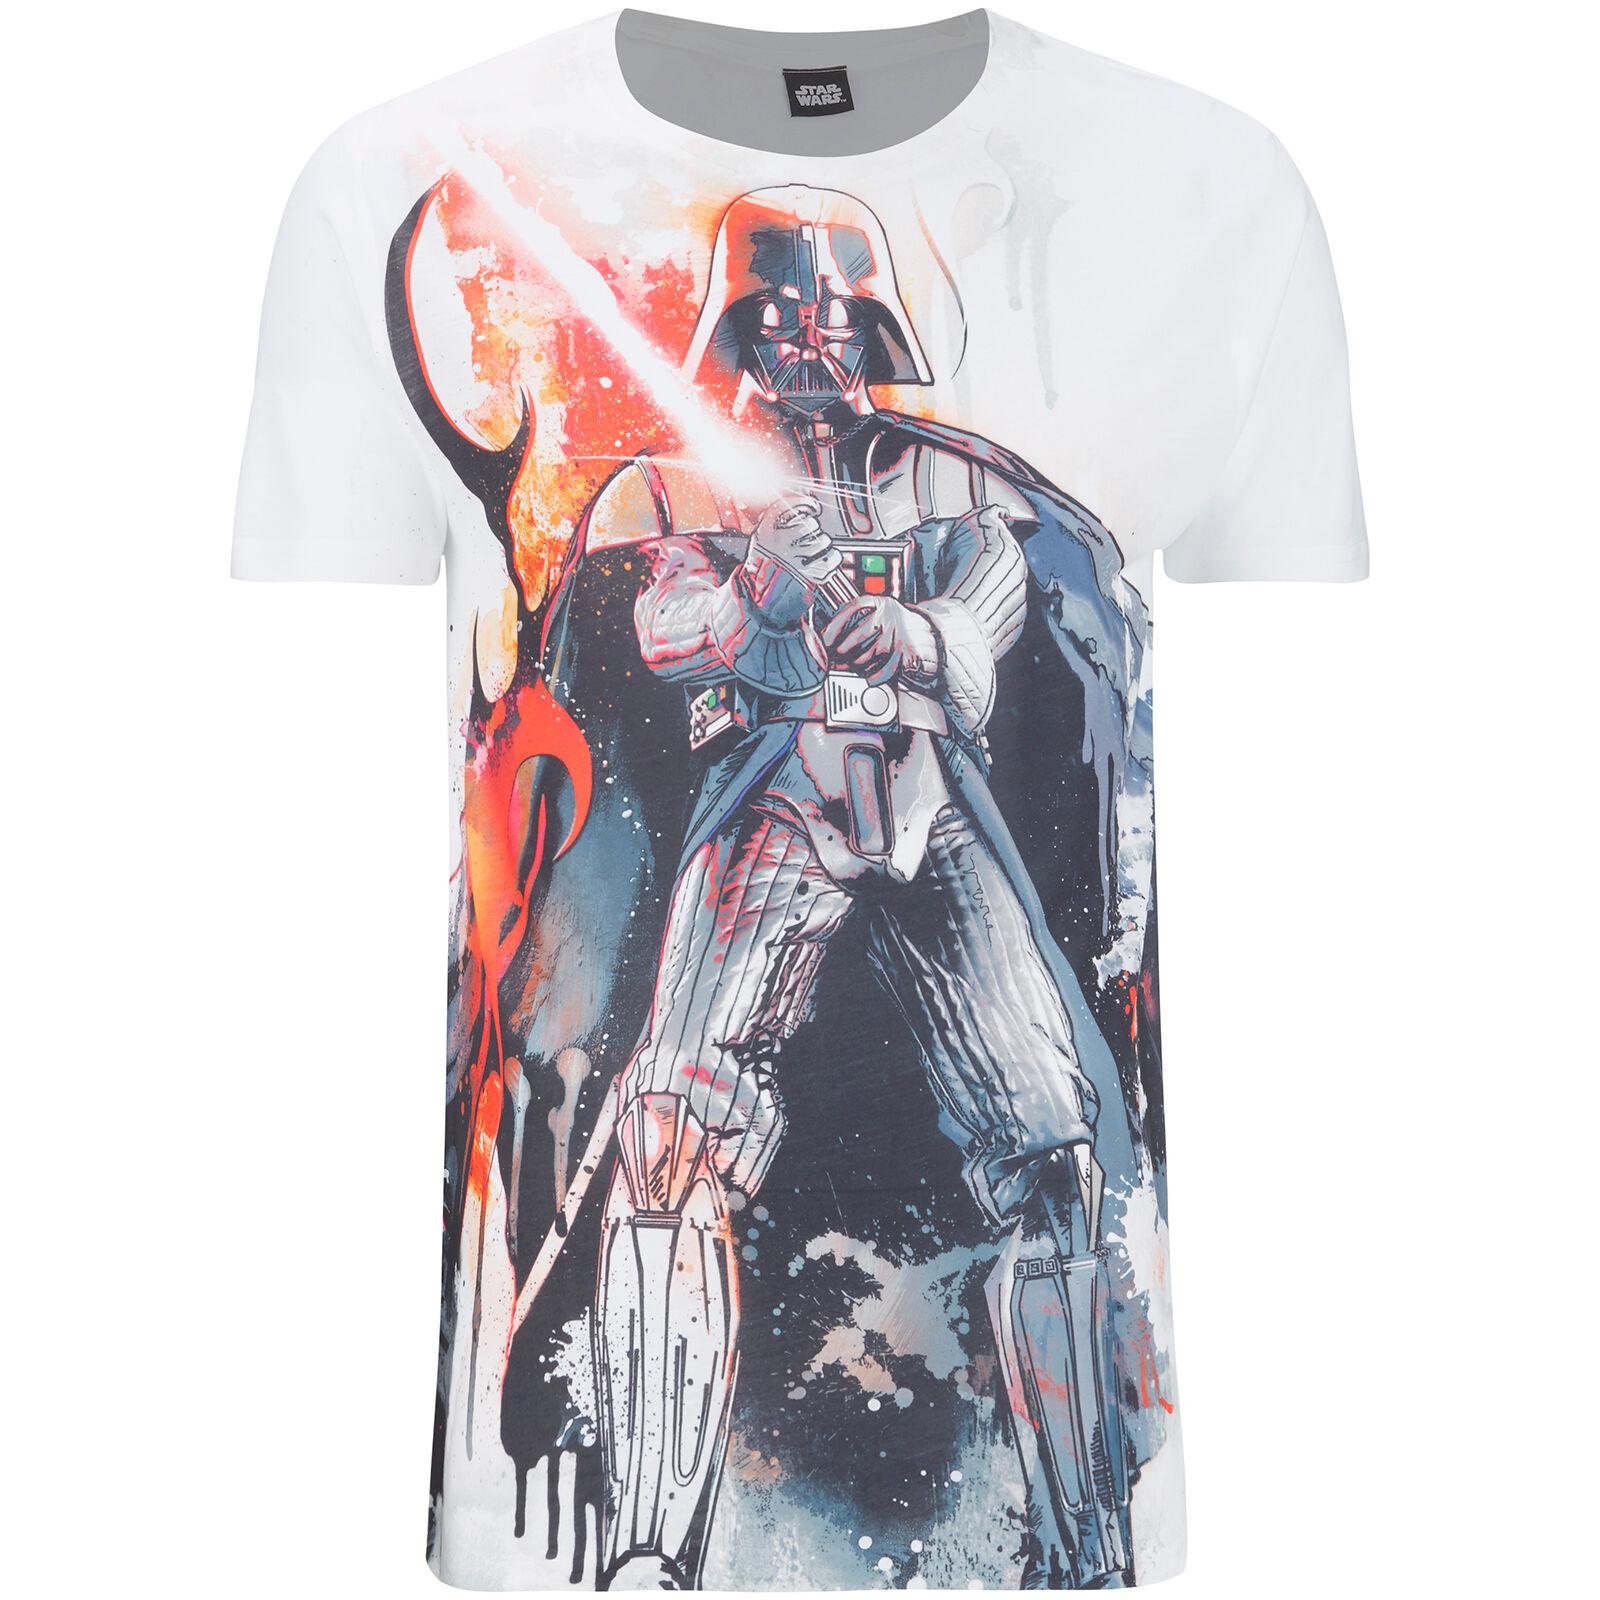 Geek Clothing Star Wars Men's Vader Stencil T-Shirt - White - M - White